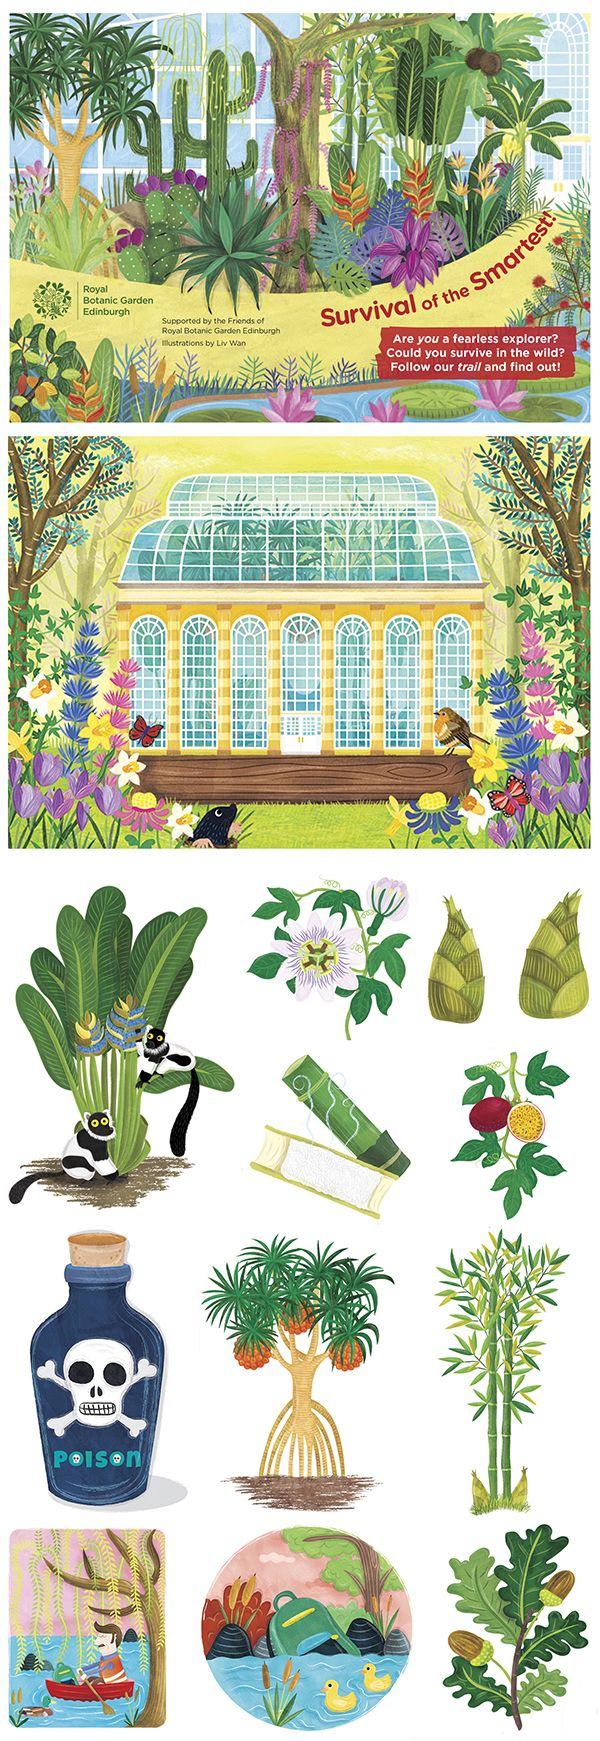 1000+ images about Royal Botanic Garden Edinburgh. on Pinterest.